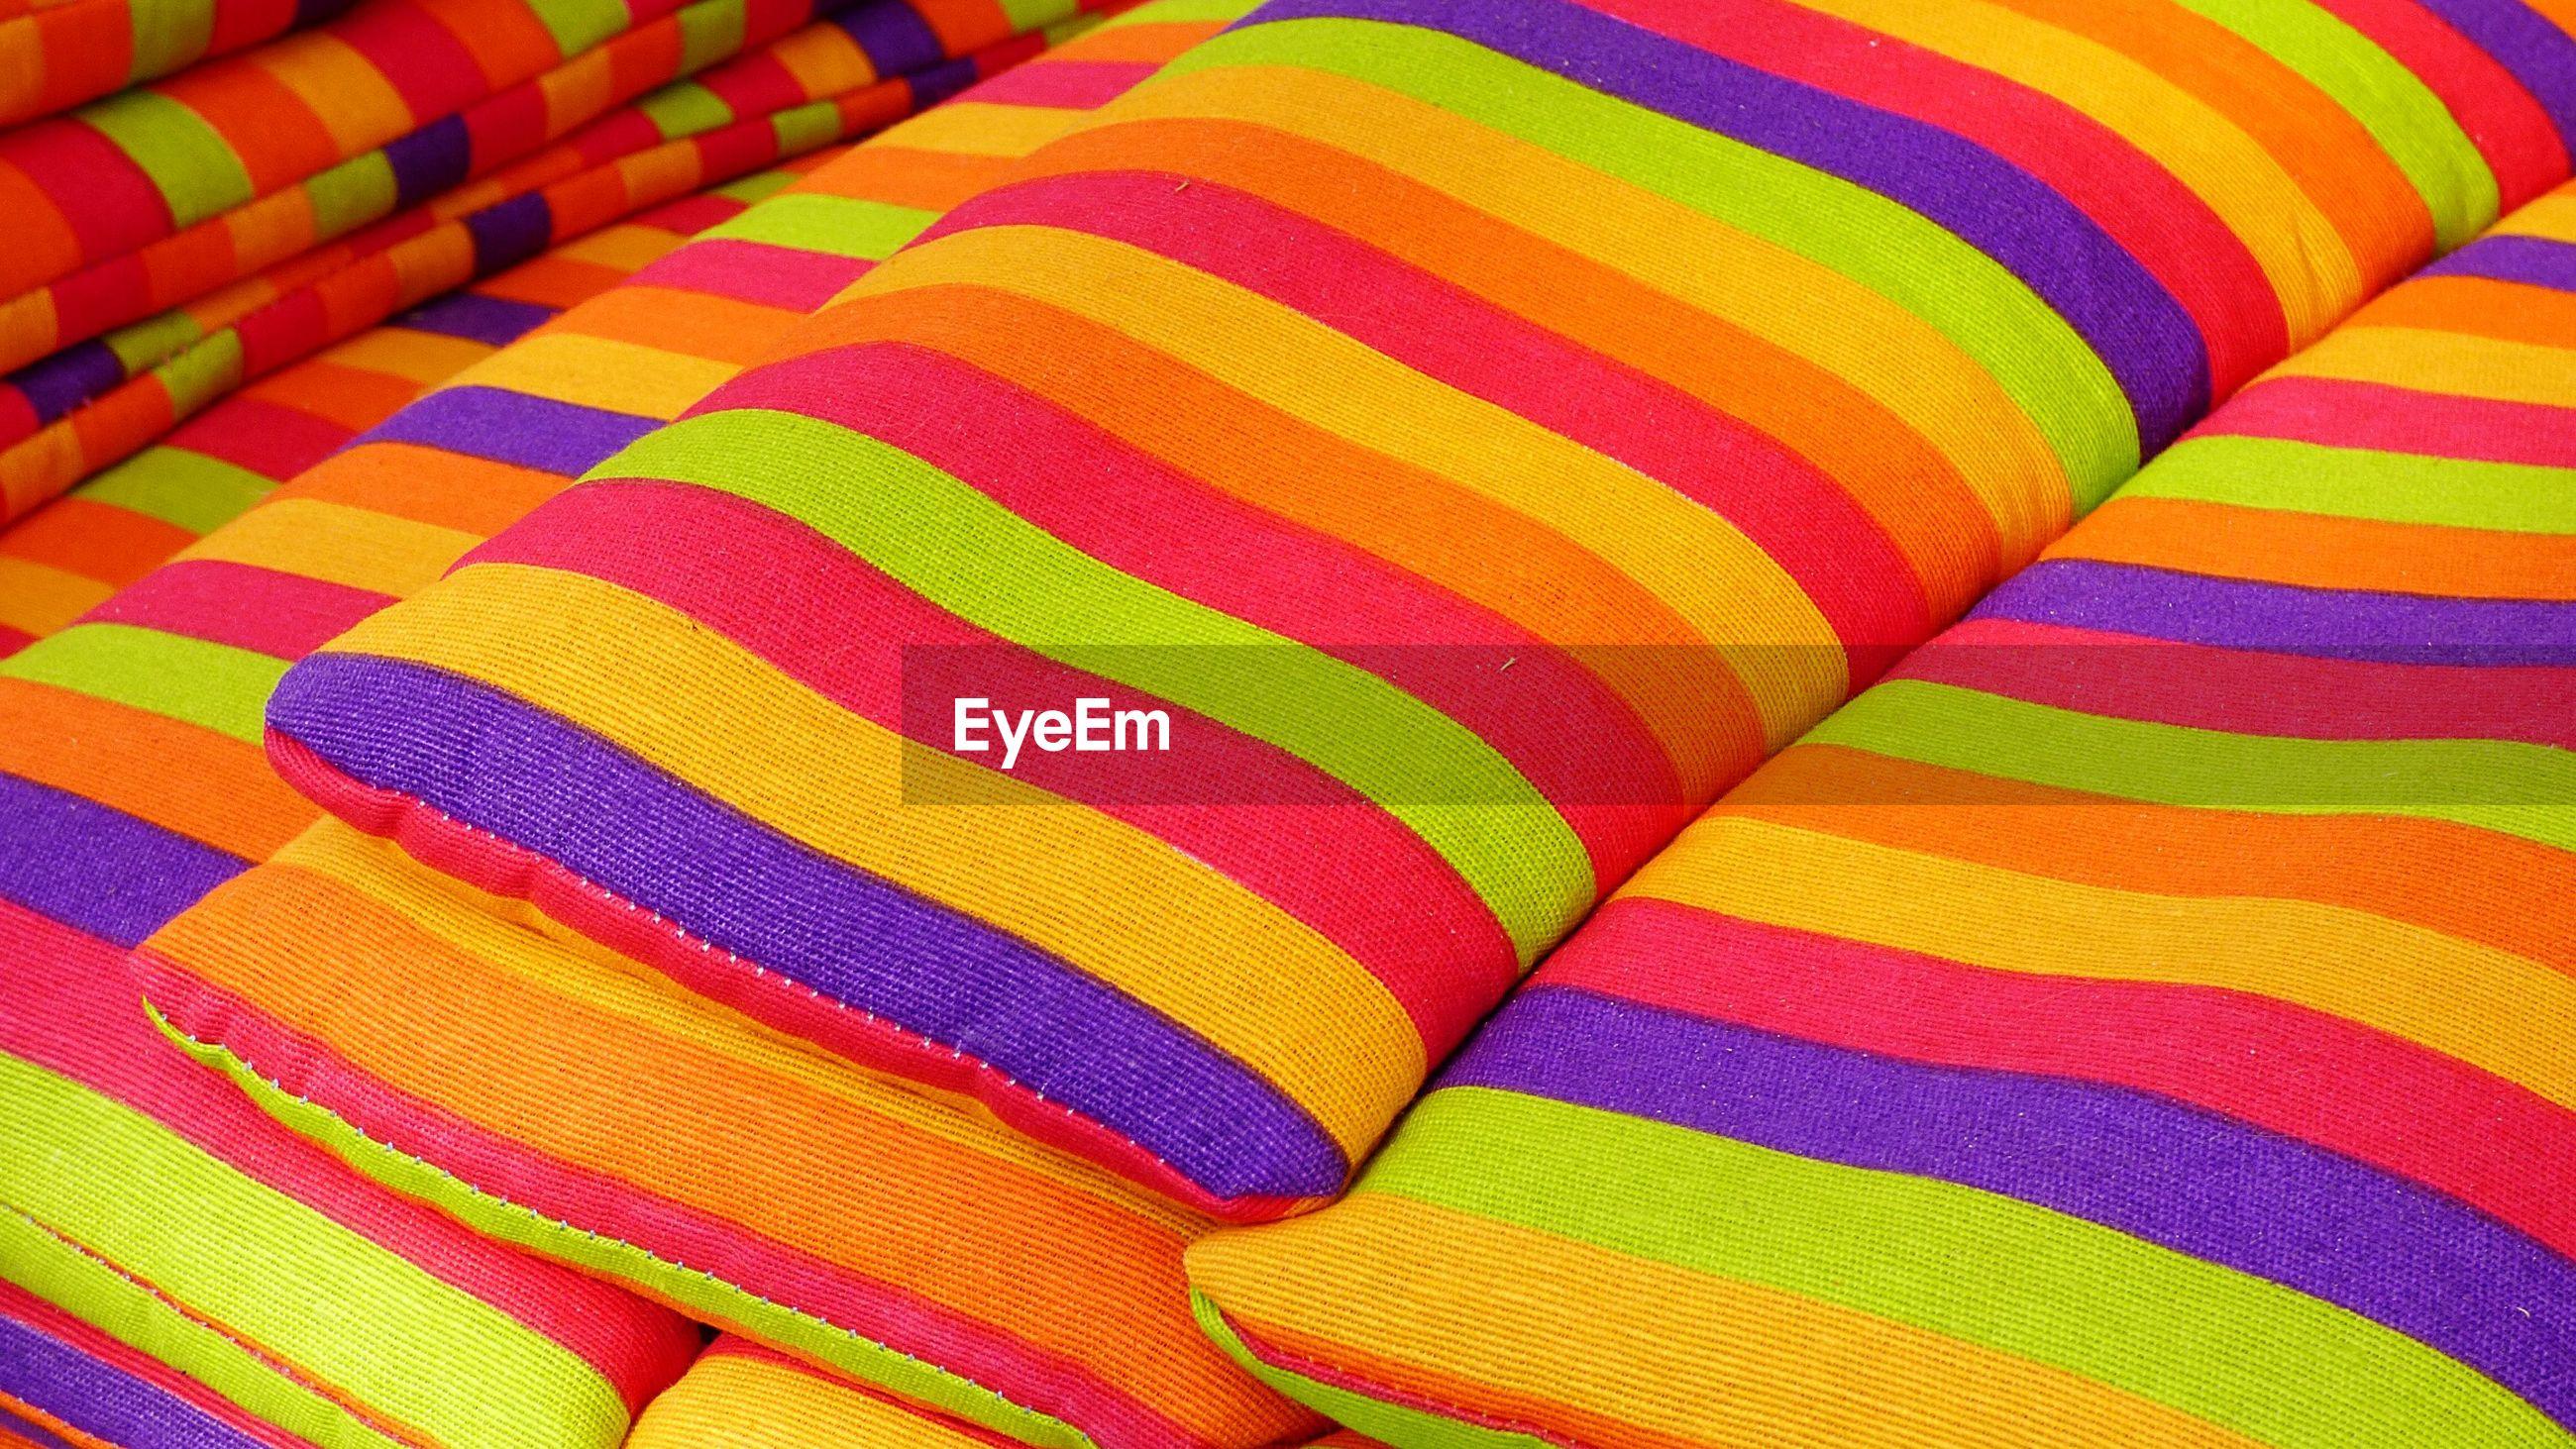 Full frame shot of colorful pillows